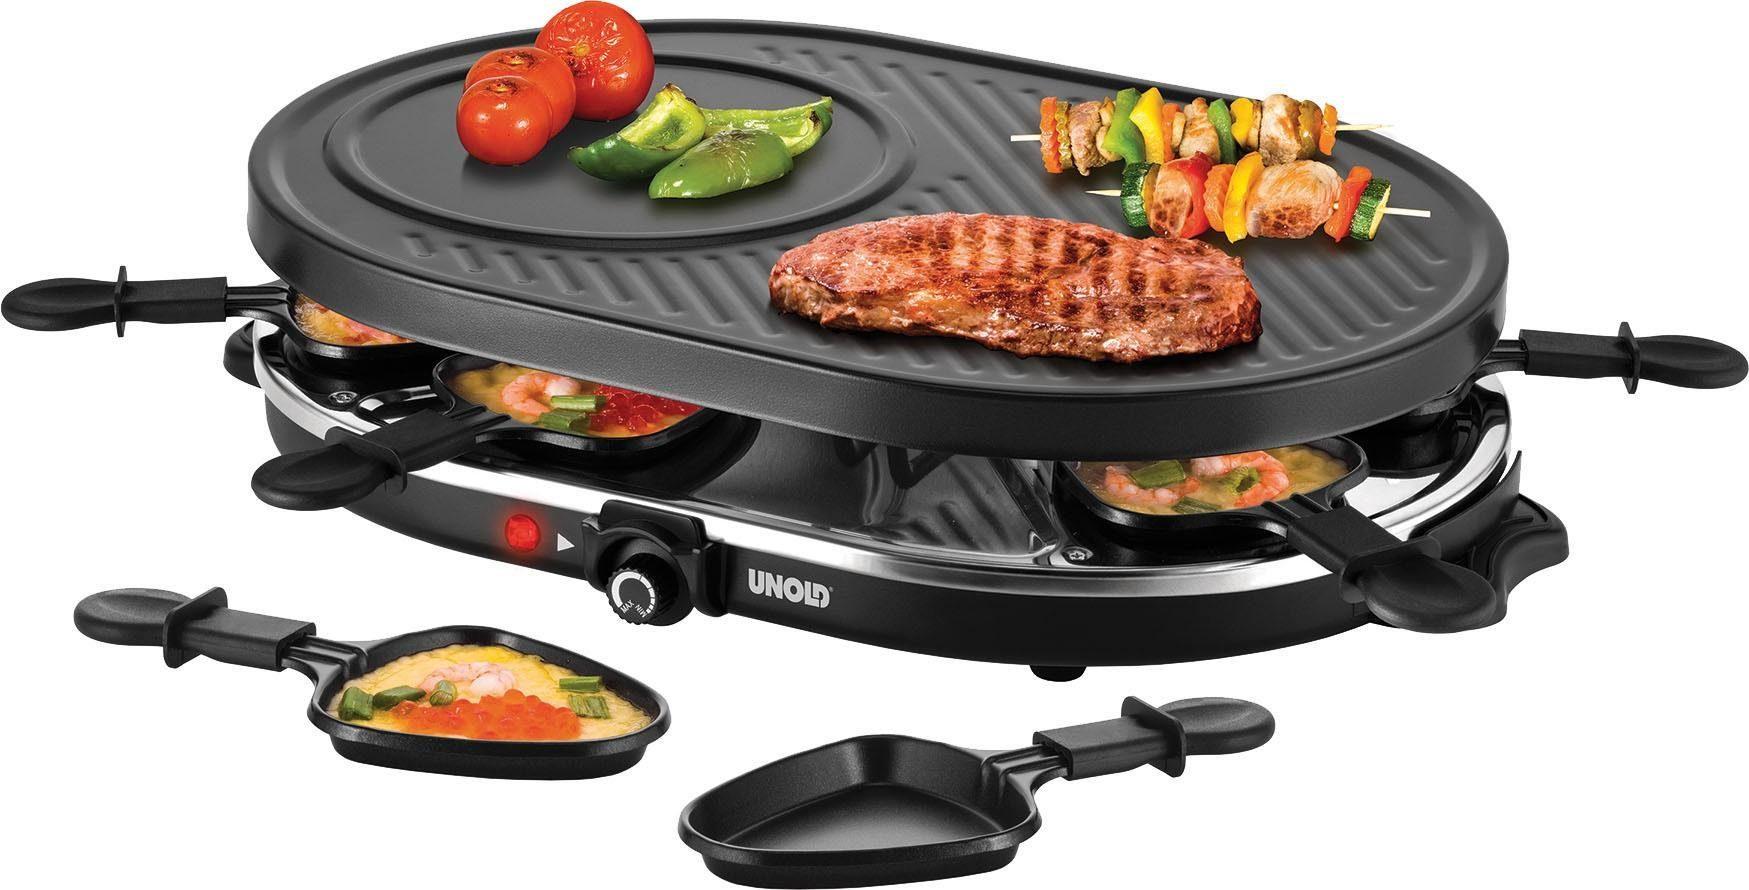 Unold Raclette Gourmet 48795, 8 Raclettepfännchen, 1200 W